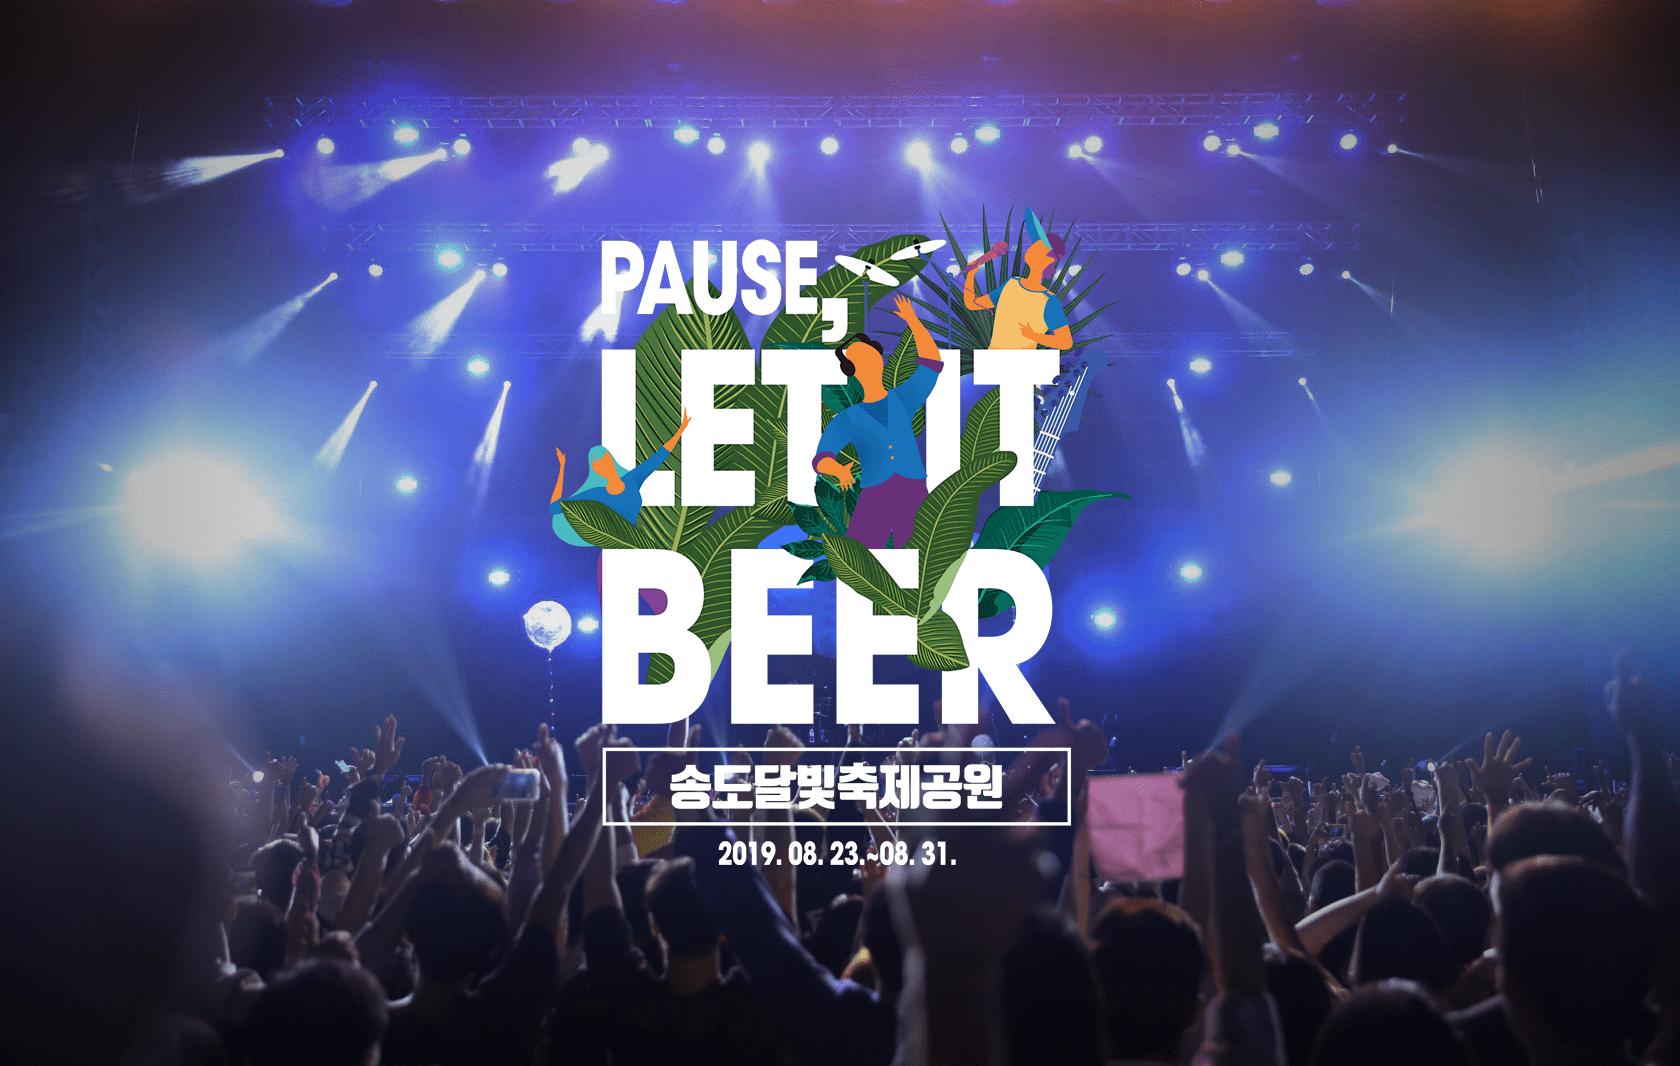 Songdo Beer Festival   Yeonsu, Incheon